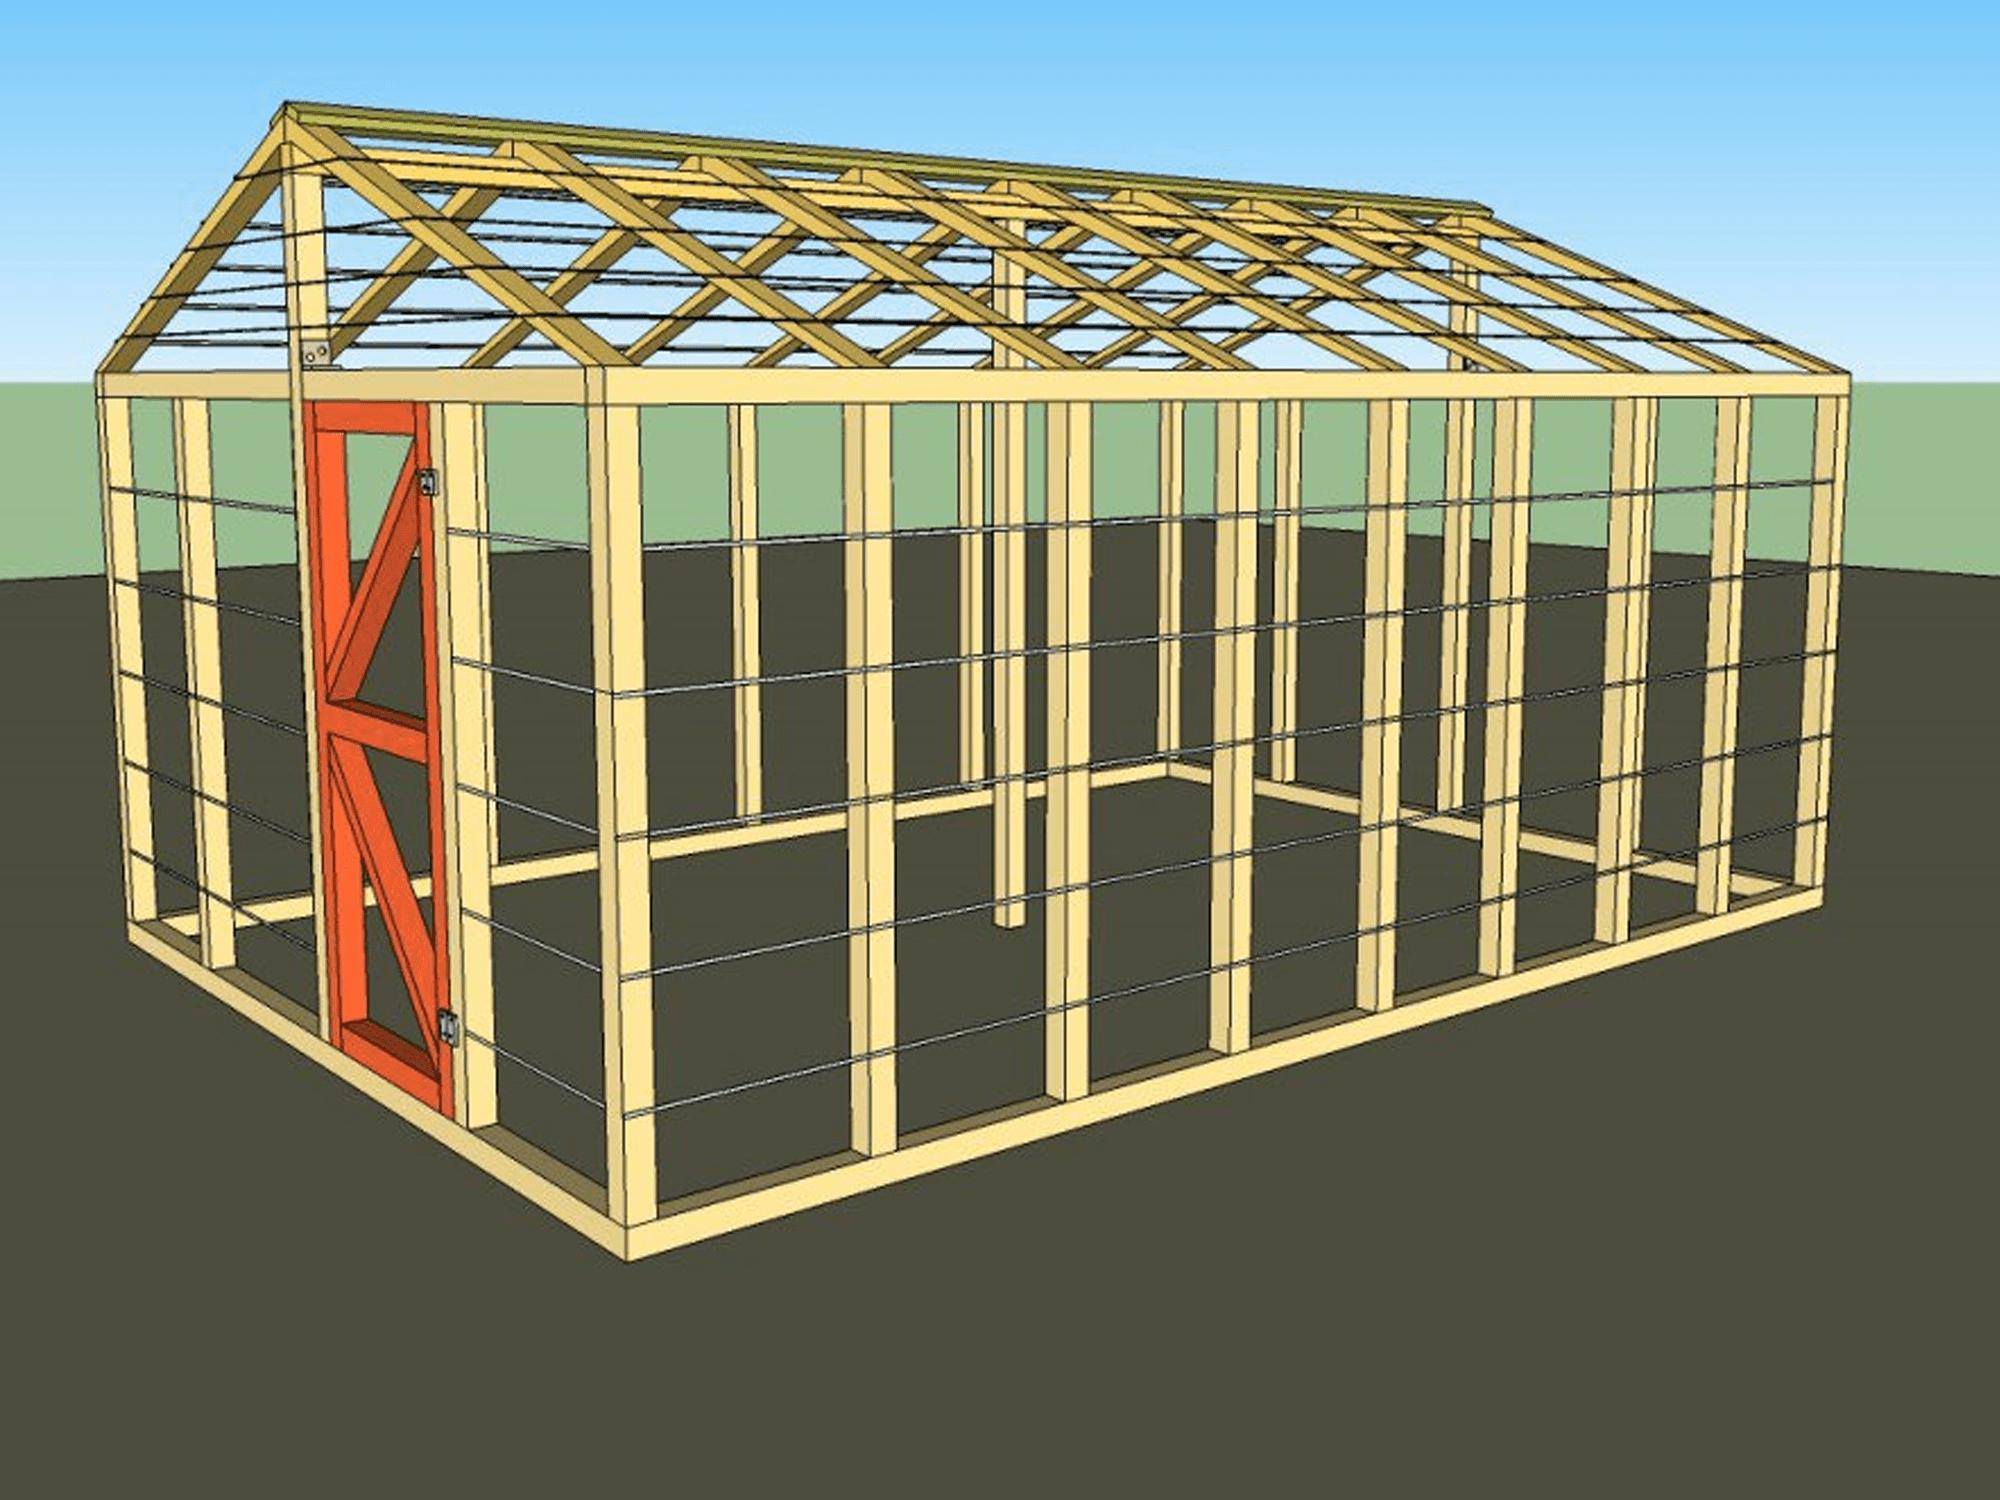 13 Free DIY Greenhouse Plans Barn Designs Small Greenhouse on barn swimming pool design, barn stable design, barn shed design, barn garage design, barn home design, barn church design, barn shop design, barn porch design, barn bedroom design,